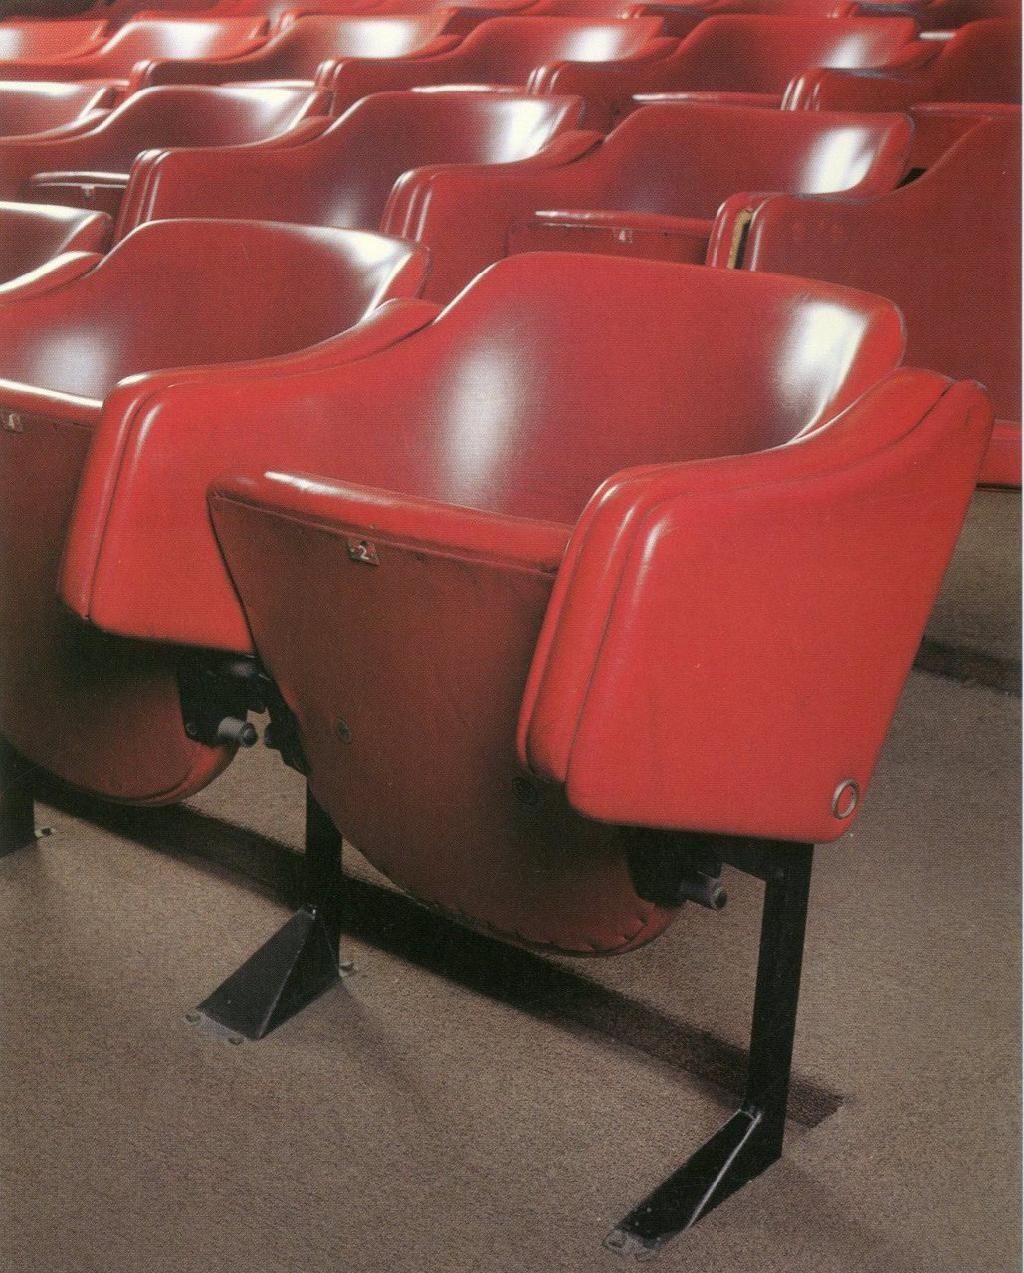 mobilia vintage lisboa daciano da costa teatro villaret lisboa 1964 design